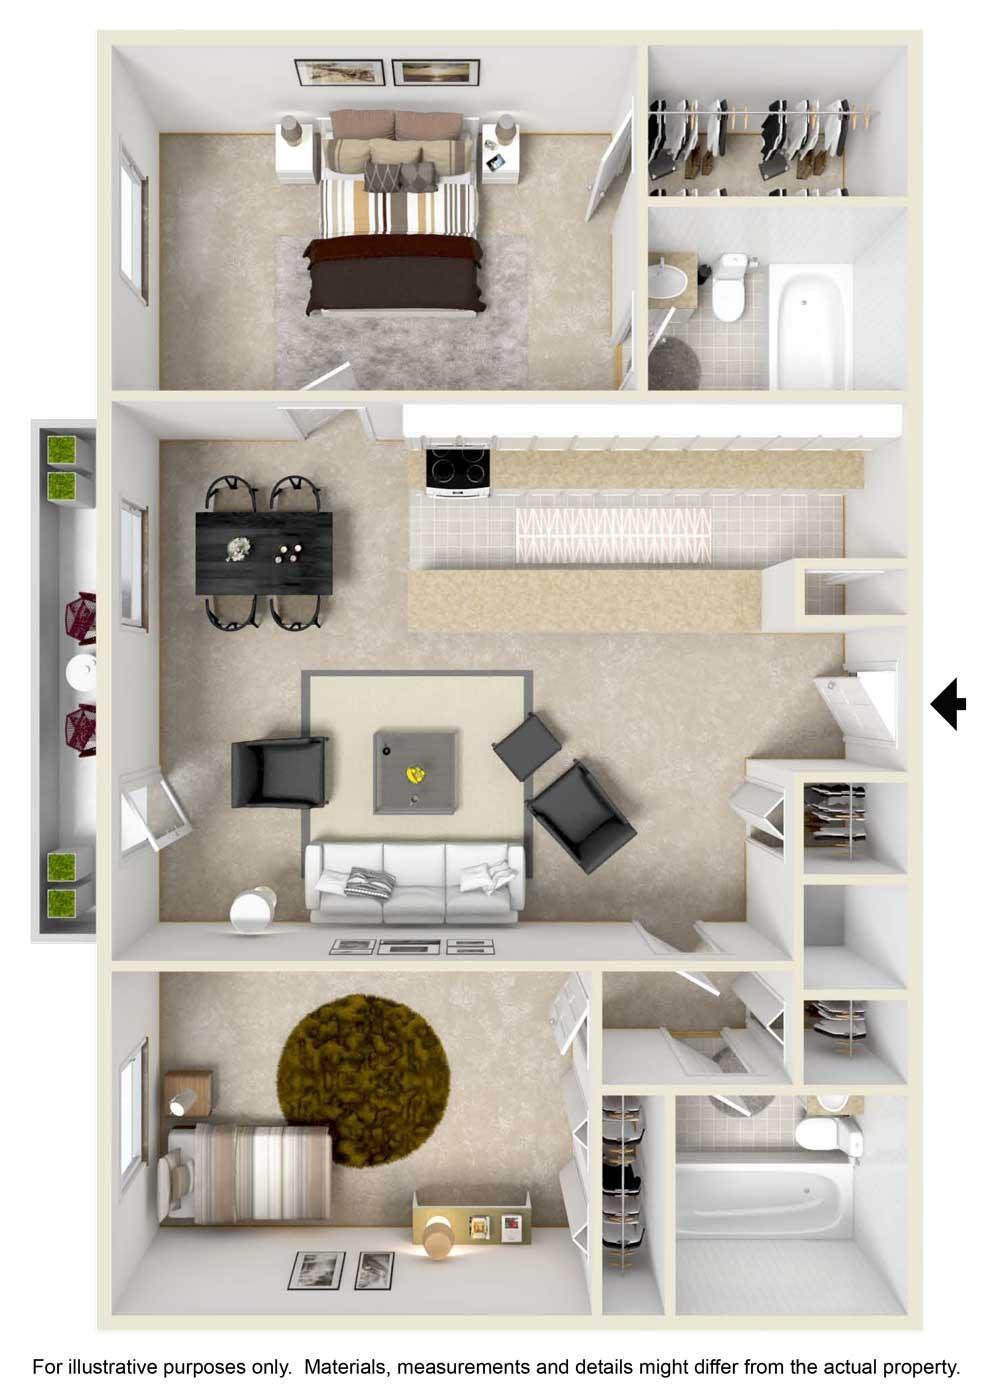 2 Bedroom / 2 Bathroom Floorplan